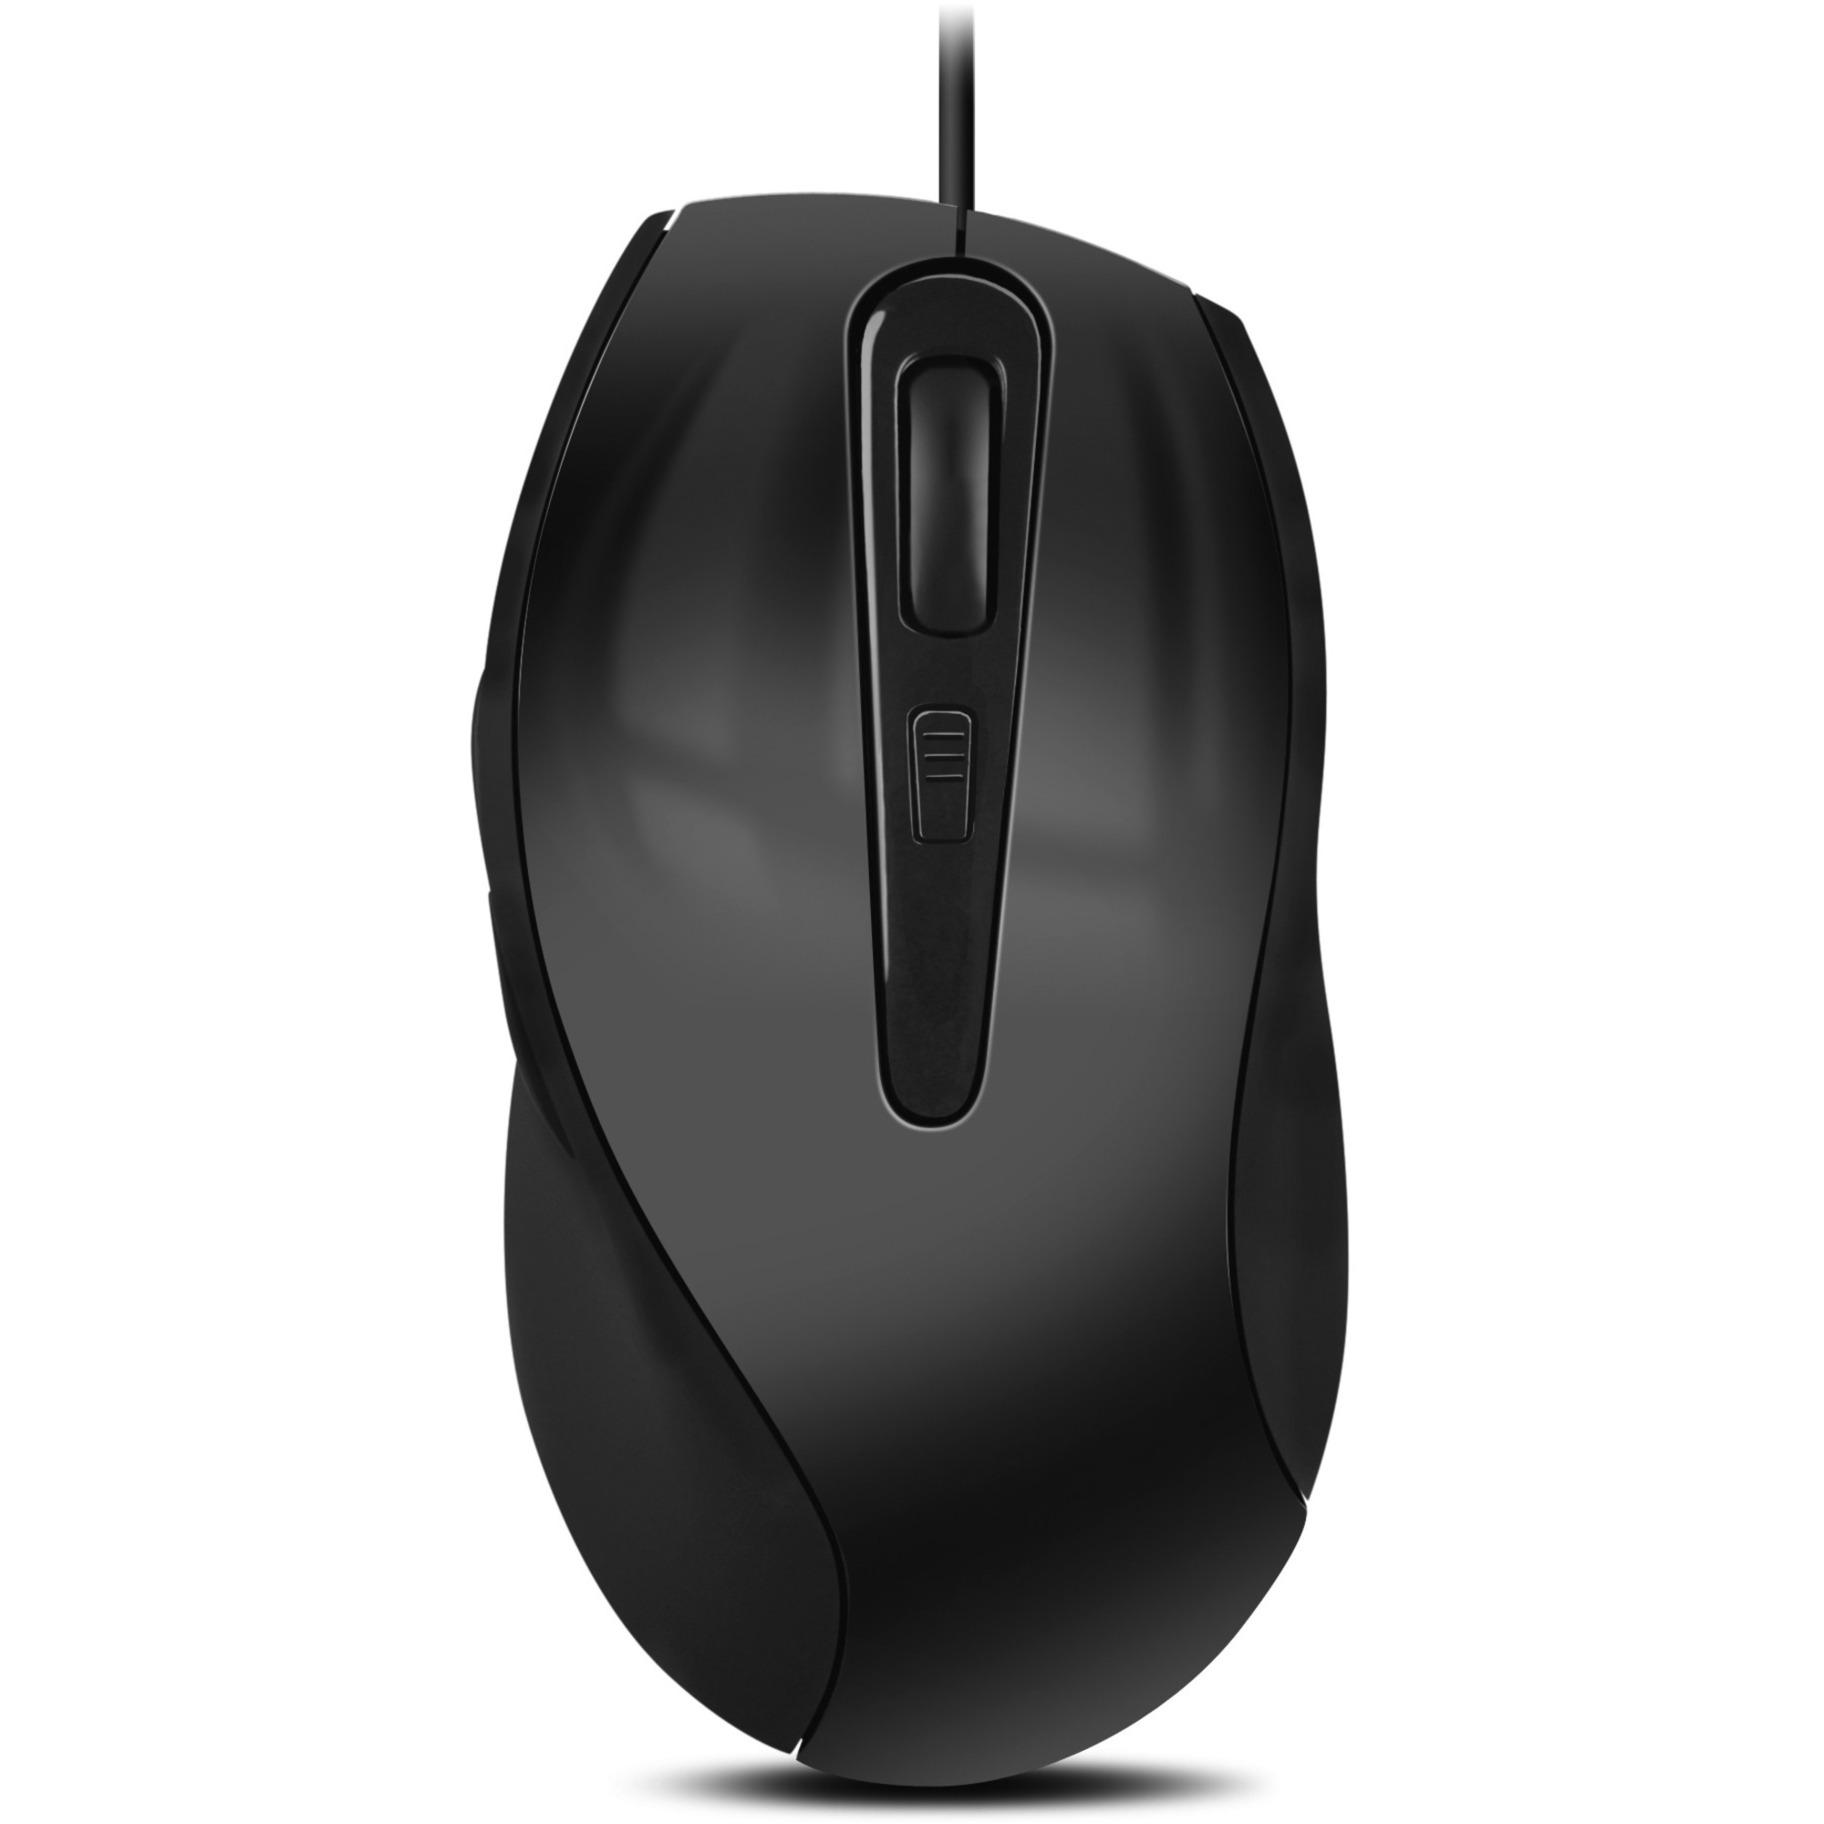 Axon USB Óptico 2400DPI Ambidextro Negro, Gris ratón